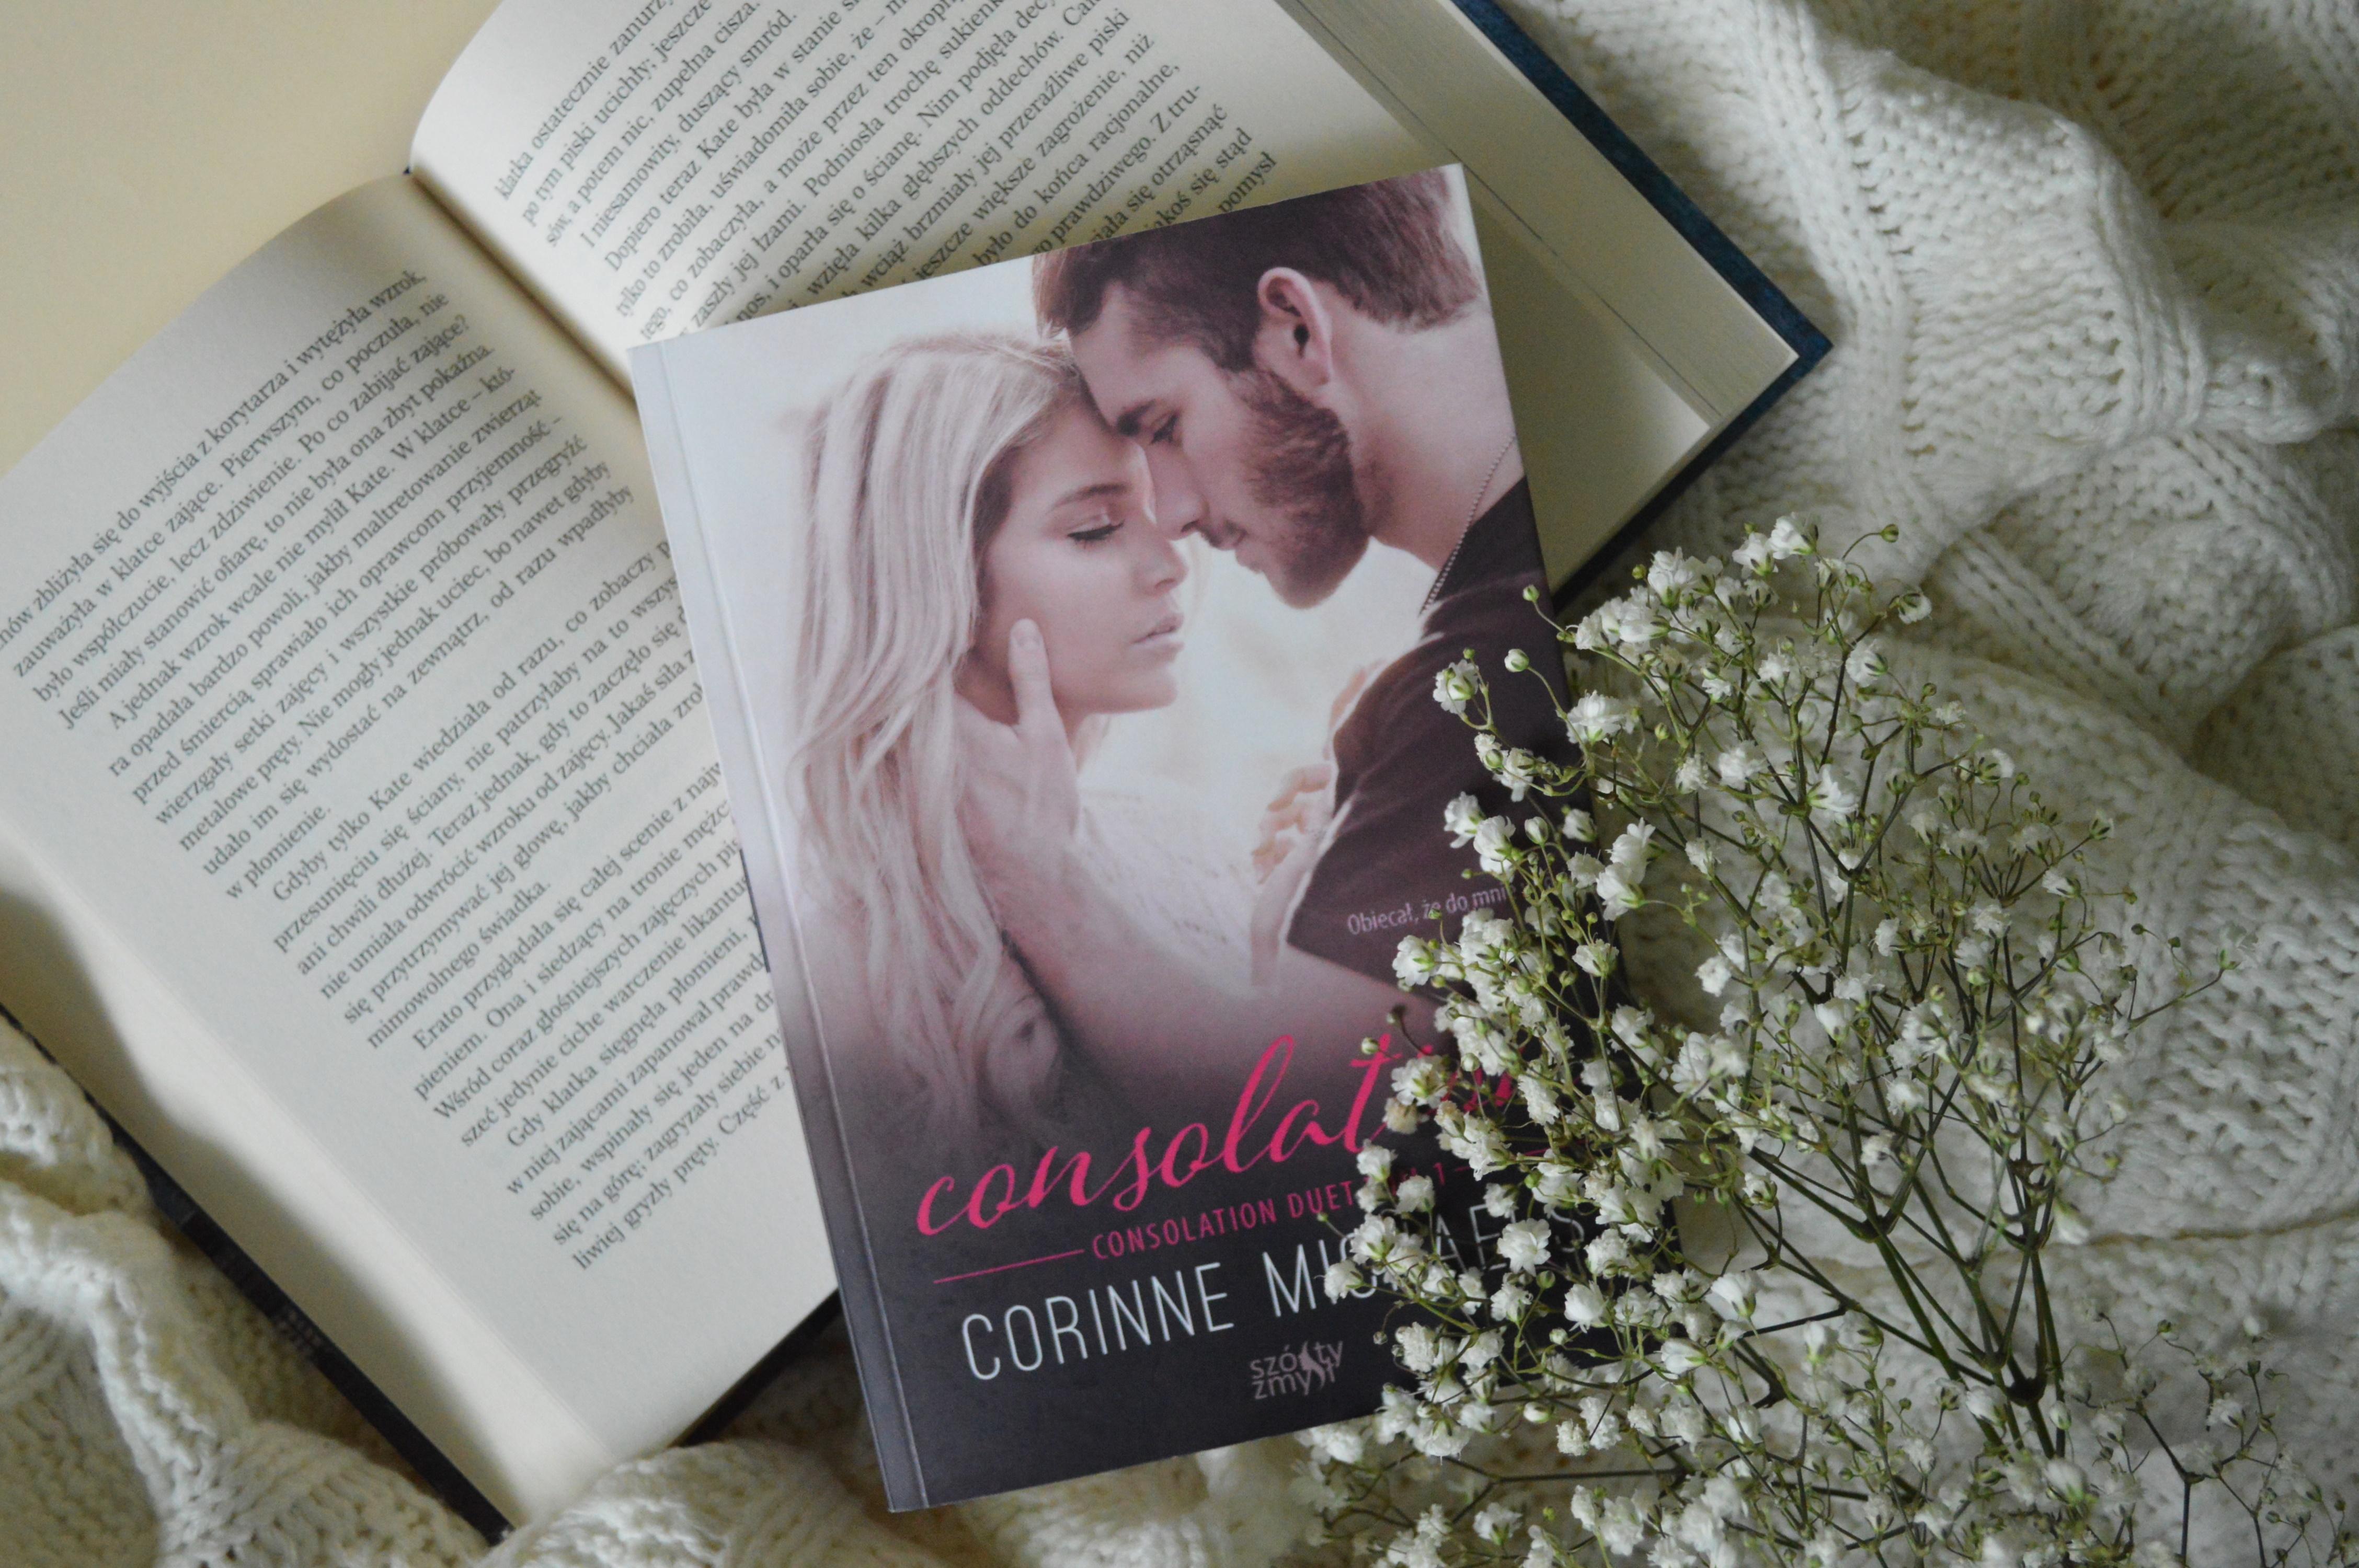 Consolation Corinne Michaels Recenzja Ksiazki Zazyj Kultury